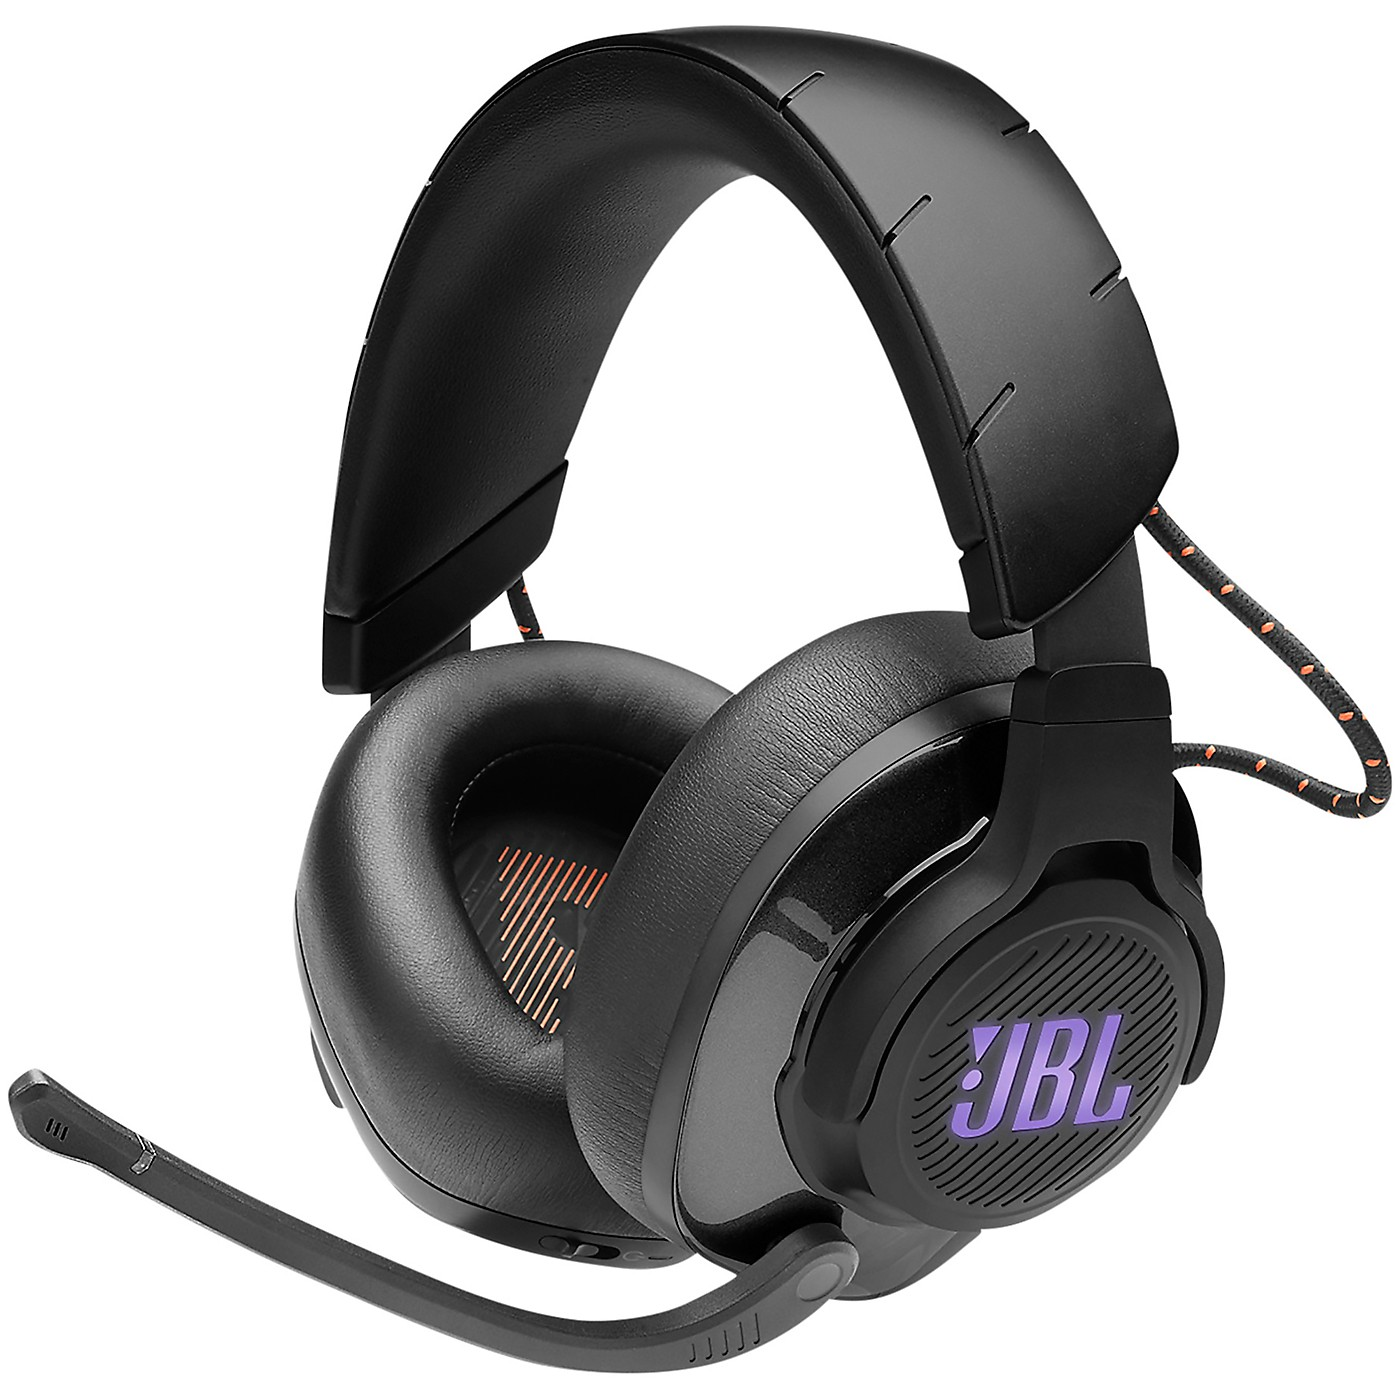 JBL Quantum 600 2.4 Ghz Wireless Over-Ear Gaming Headset thumbnail